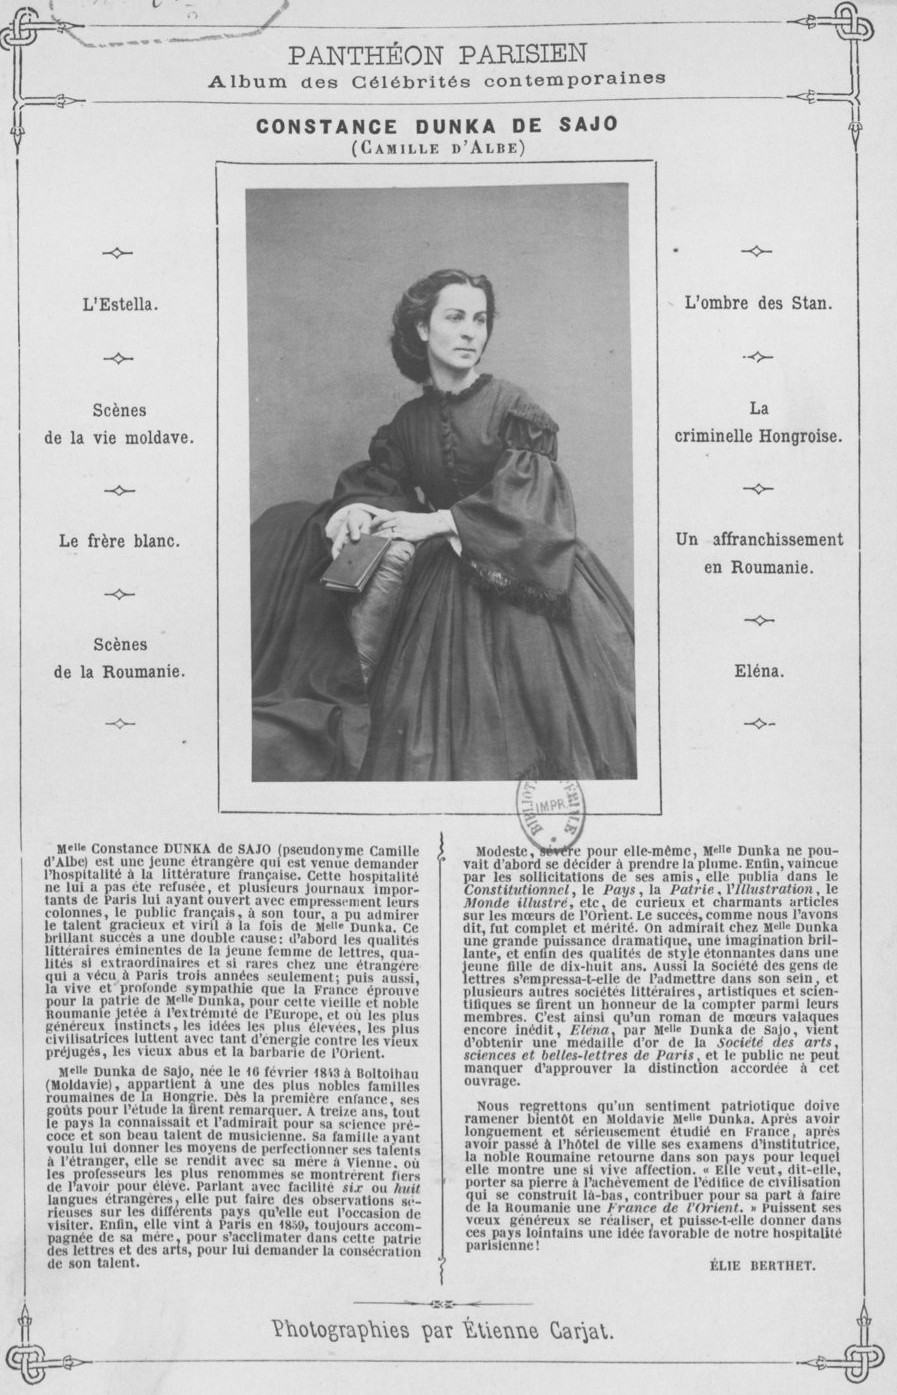 Constance Dunka de Sajo portet